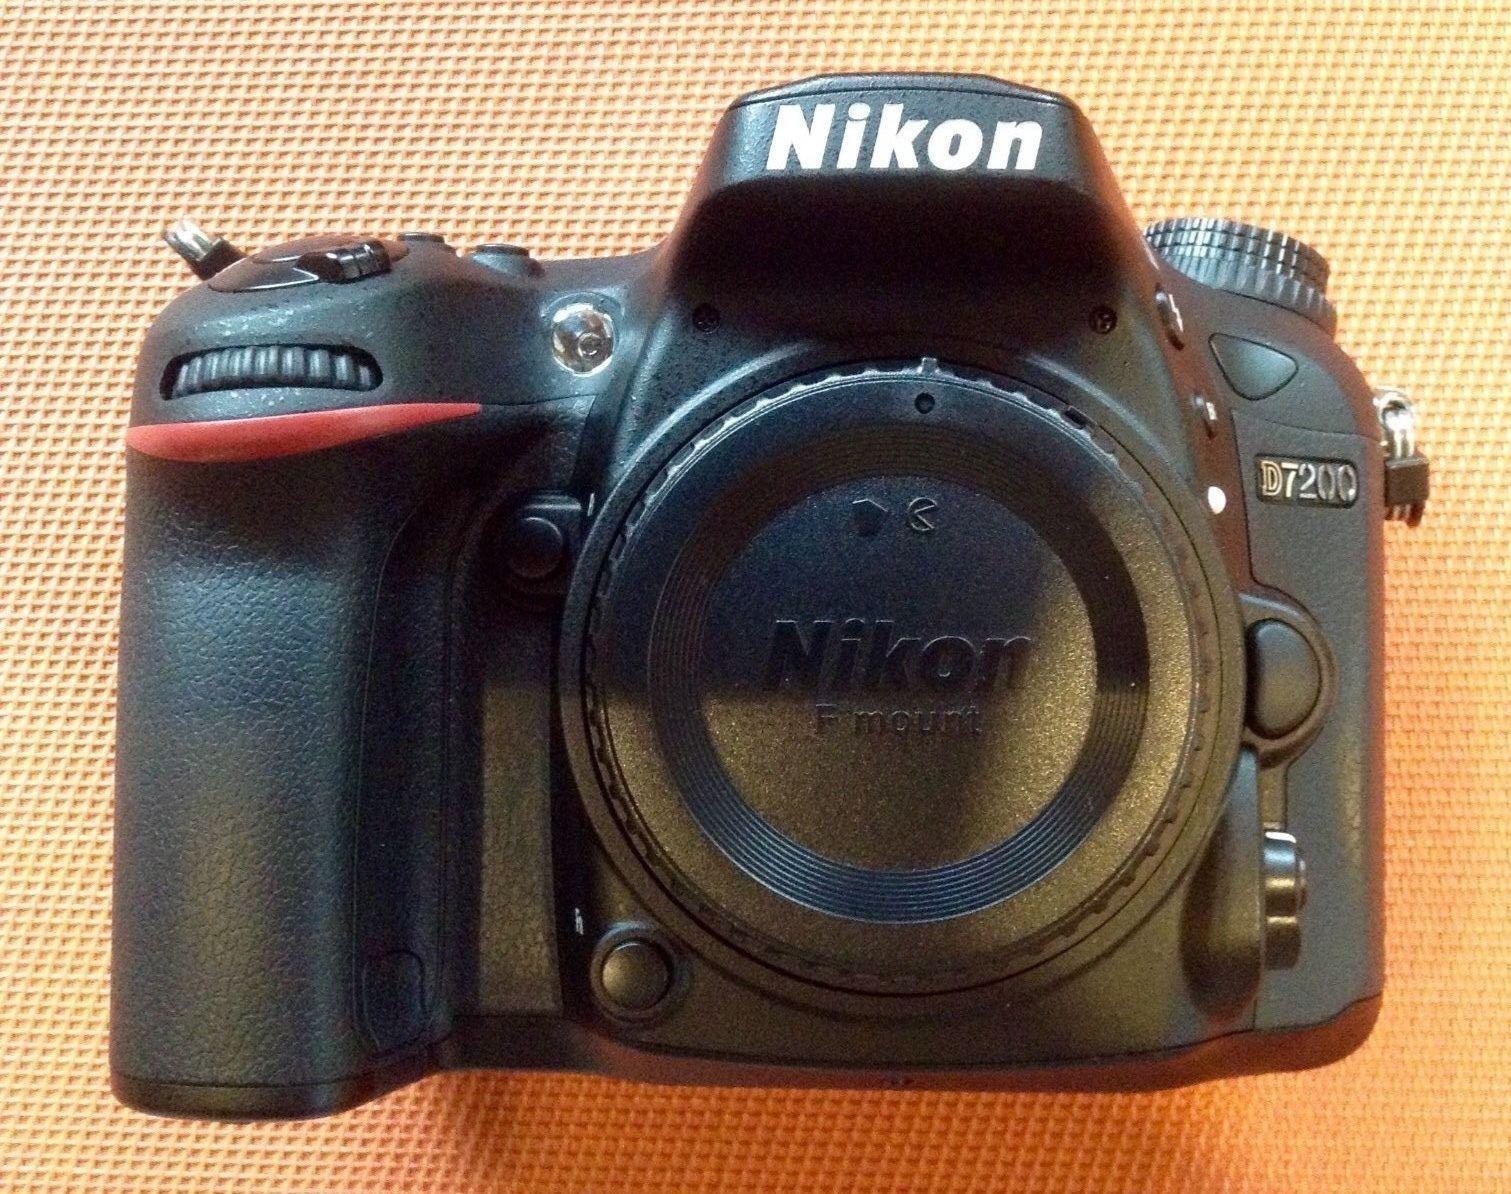 Nikon D7200 Body, neuwertig, nur 3200 Auslösungen